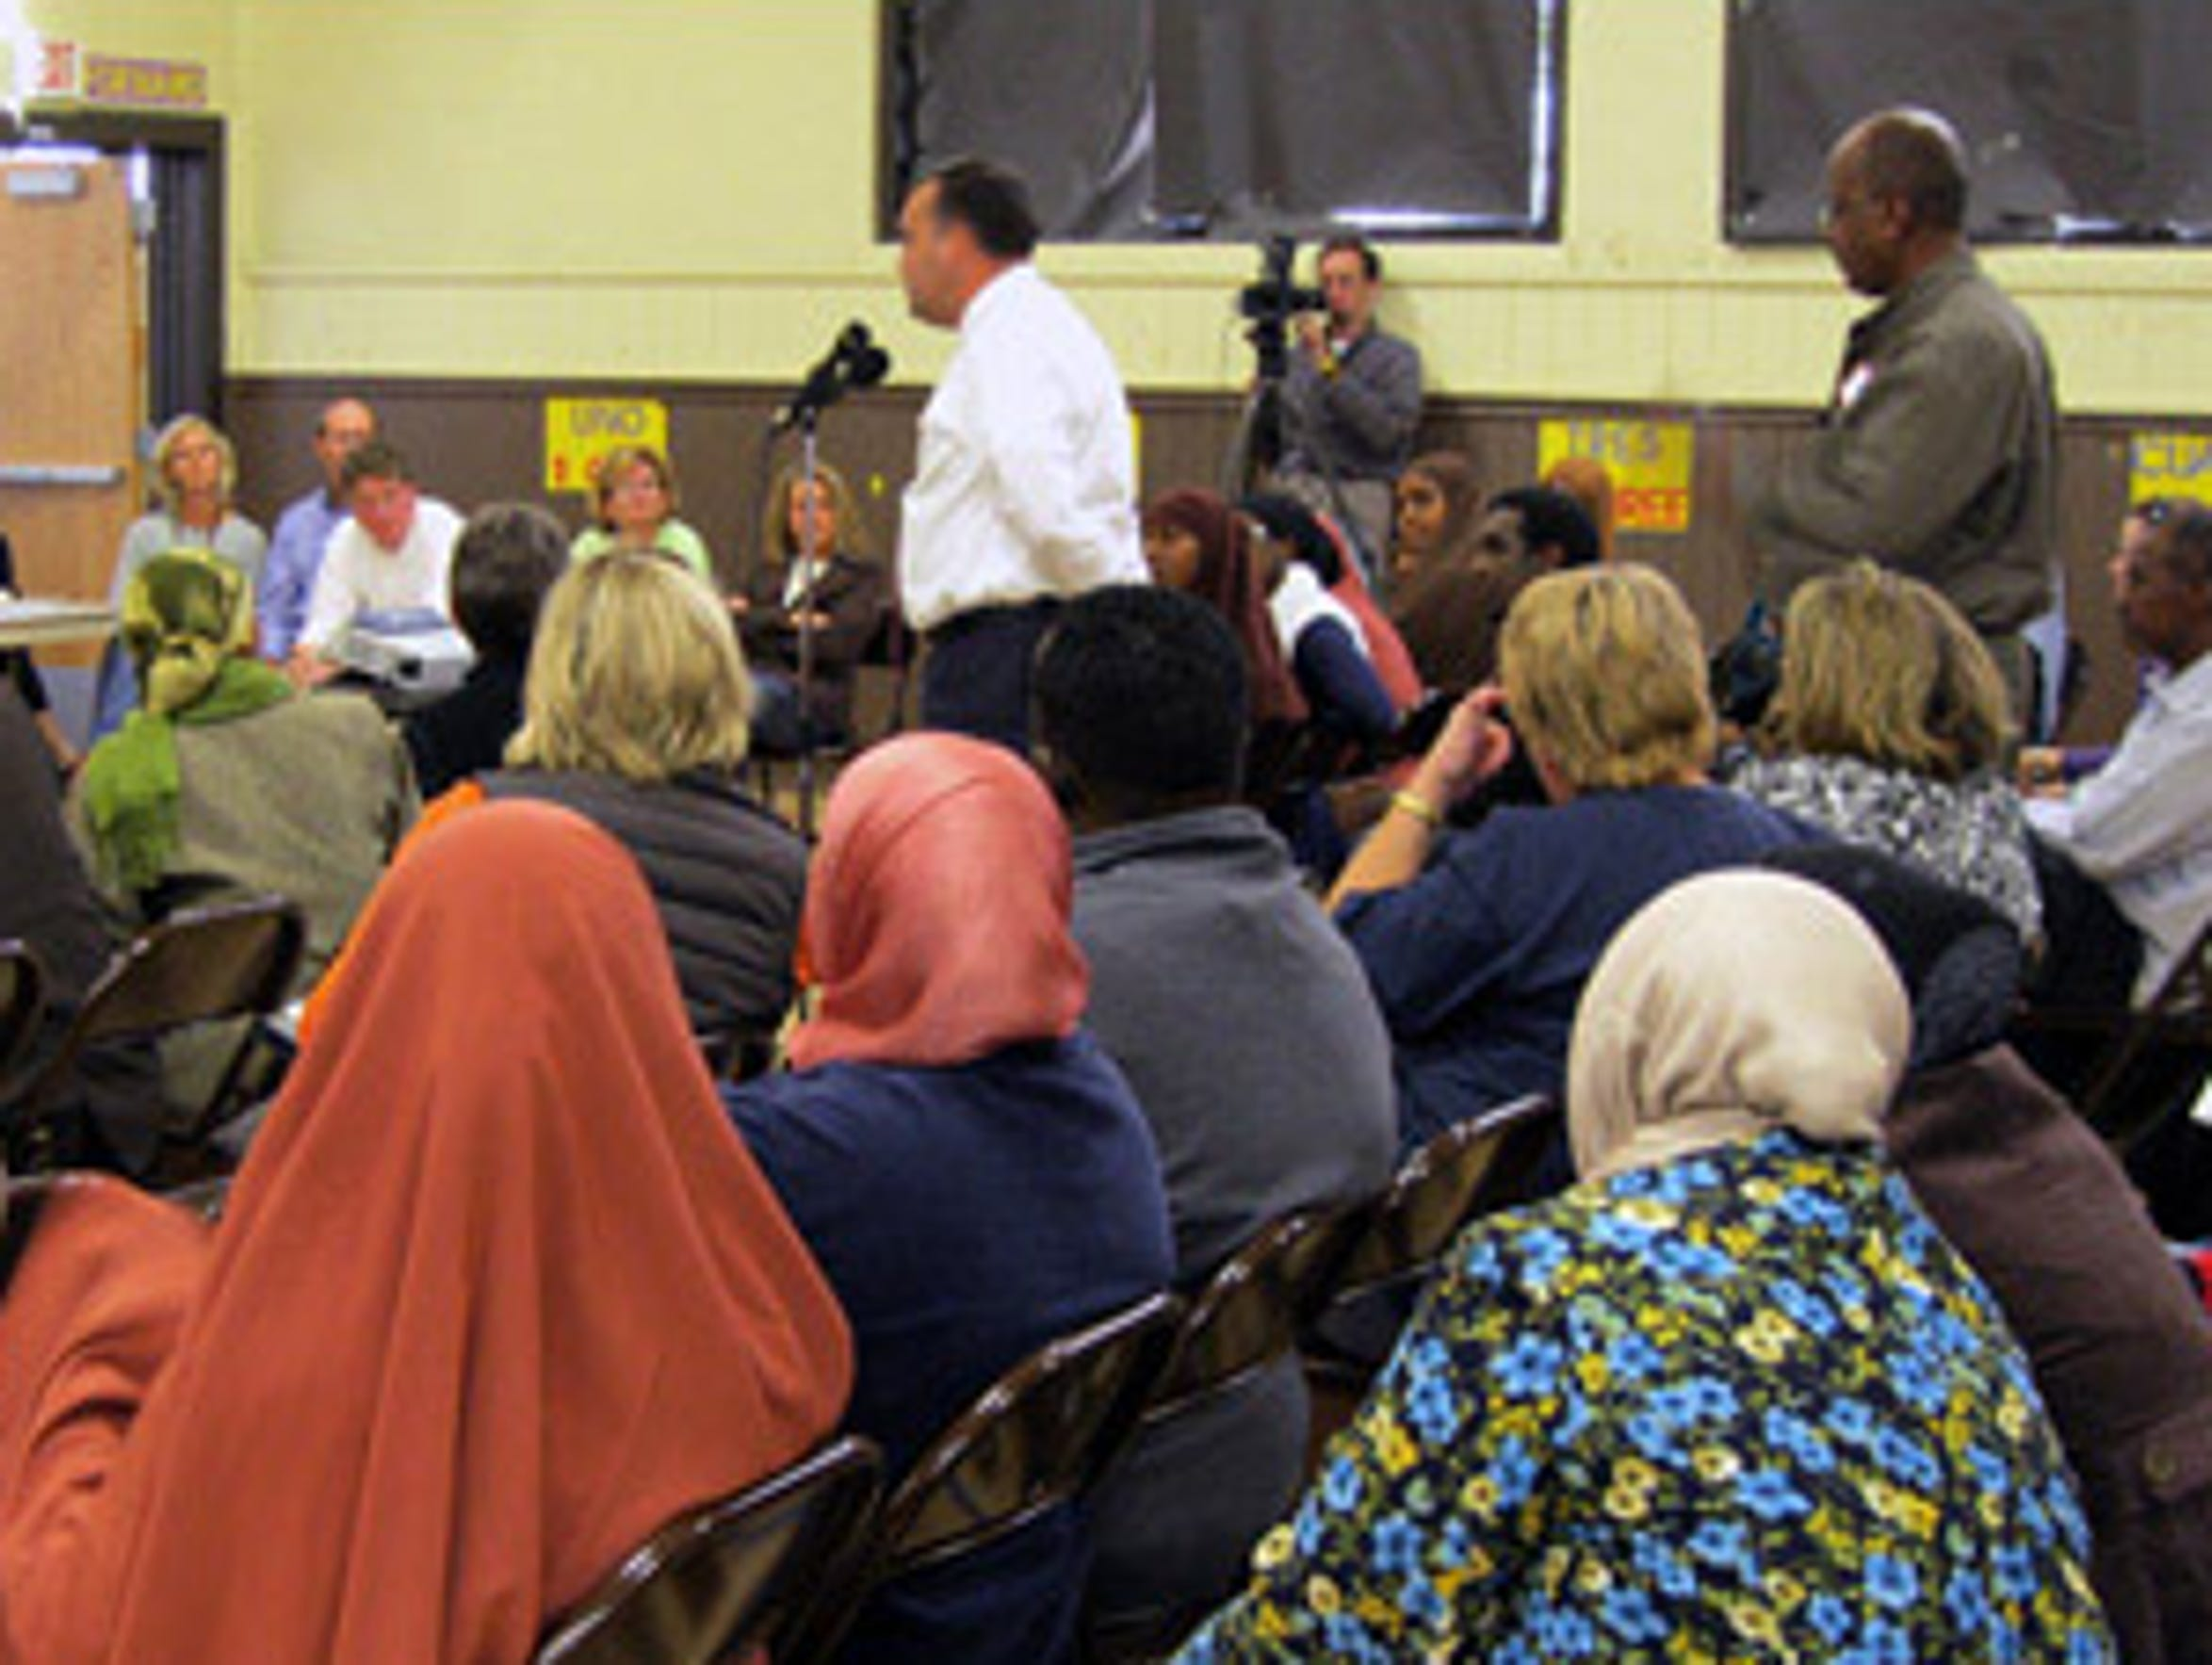 The Eden Prairie School Board listens to input from